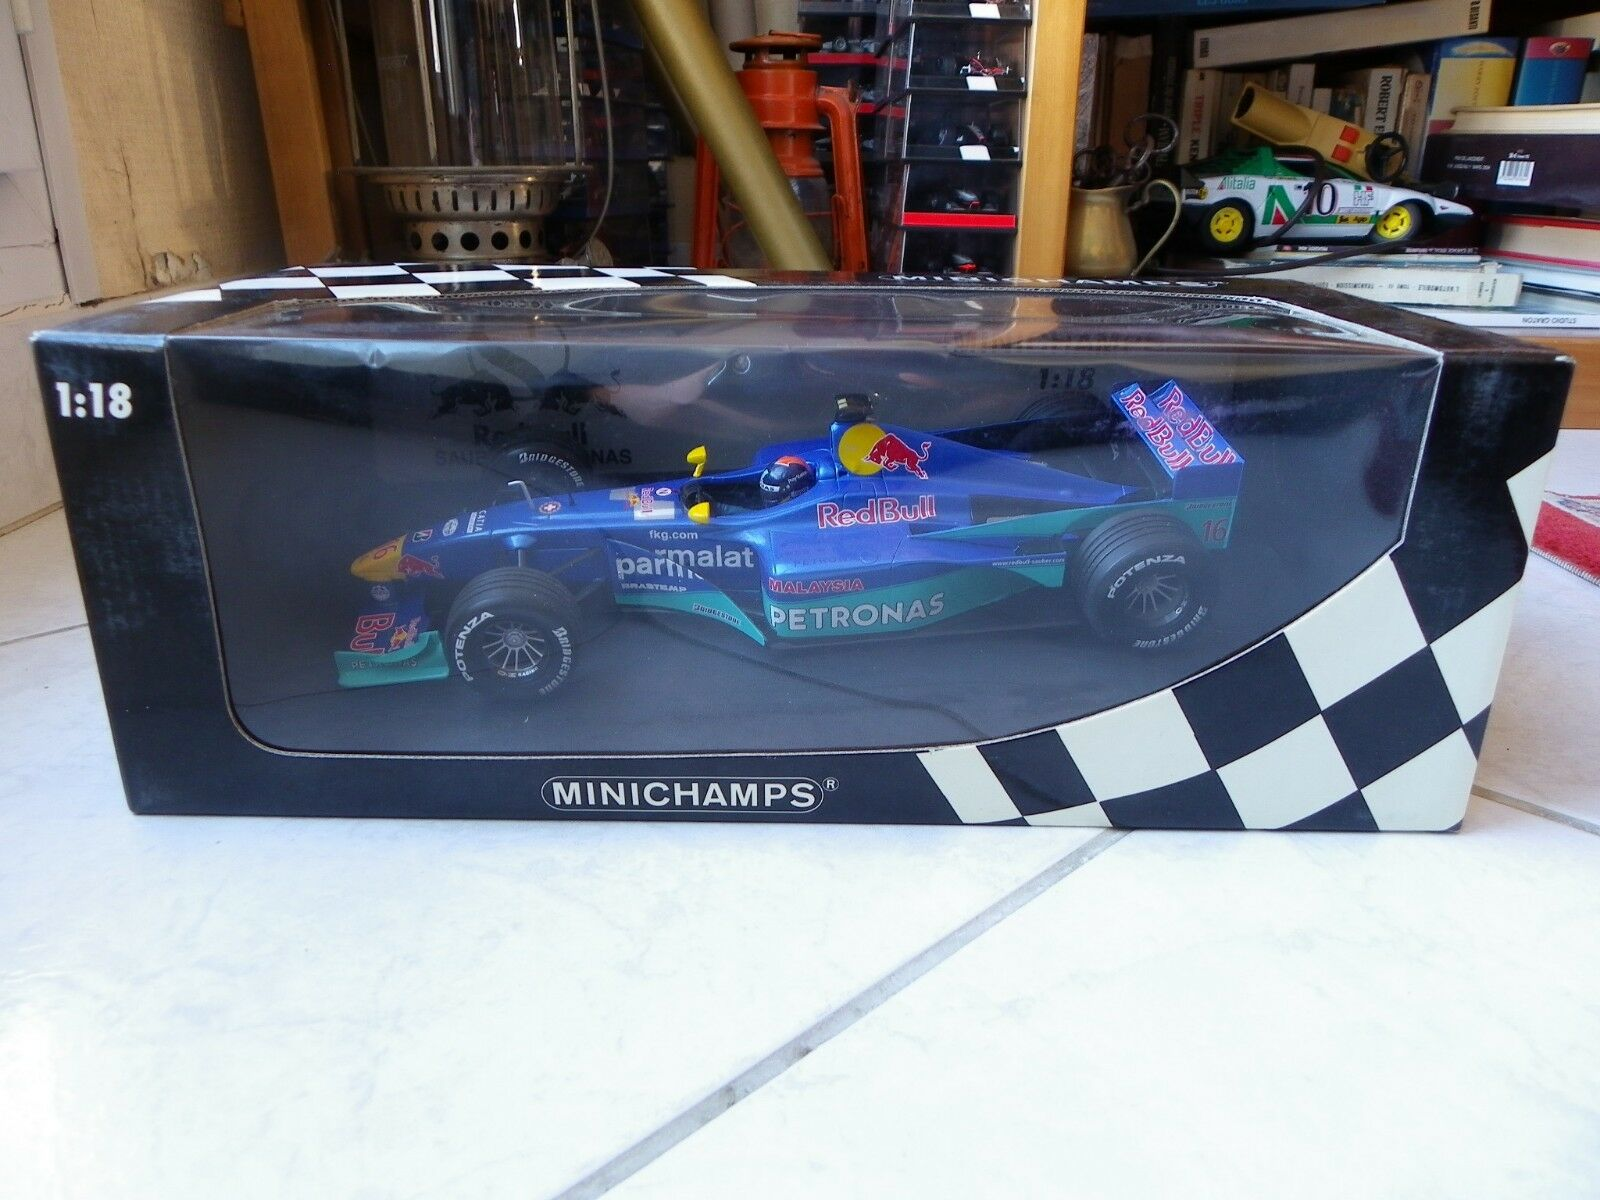 venta directa de fábrica Sauber Petronas C19 rojo Bull Bull Bull Pedro Diniz  16 1 18 Minichamps 1999 Fórmula 1 F1  más vendido